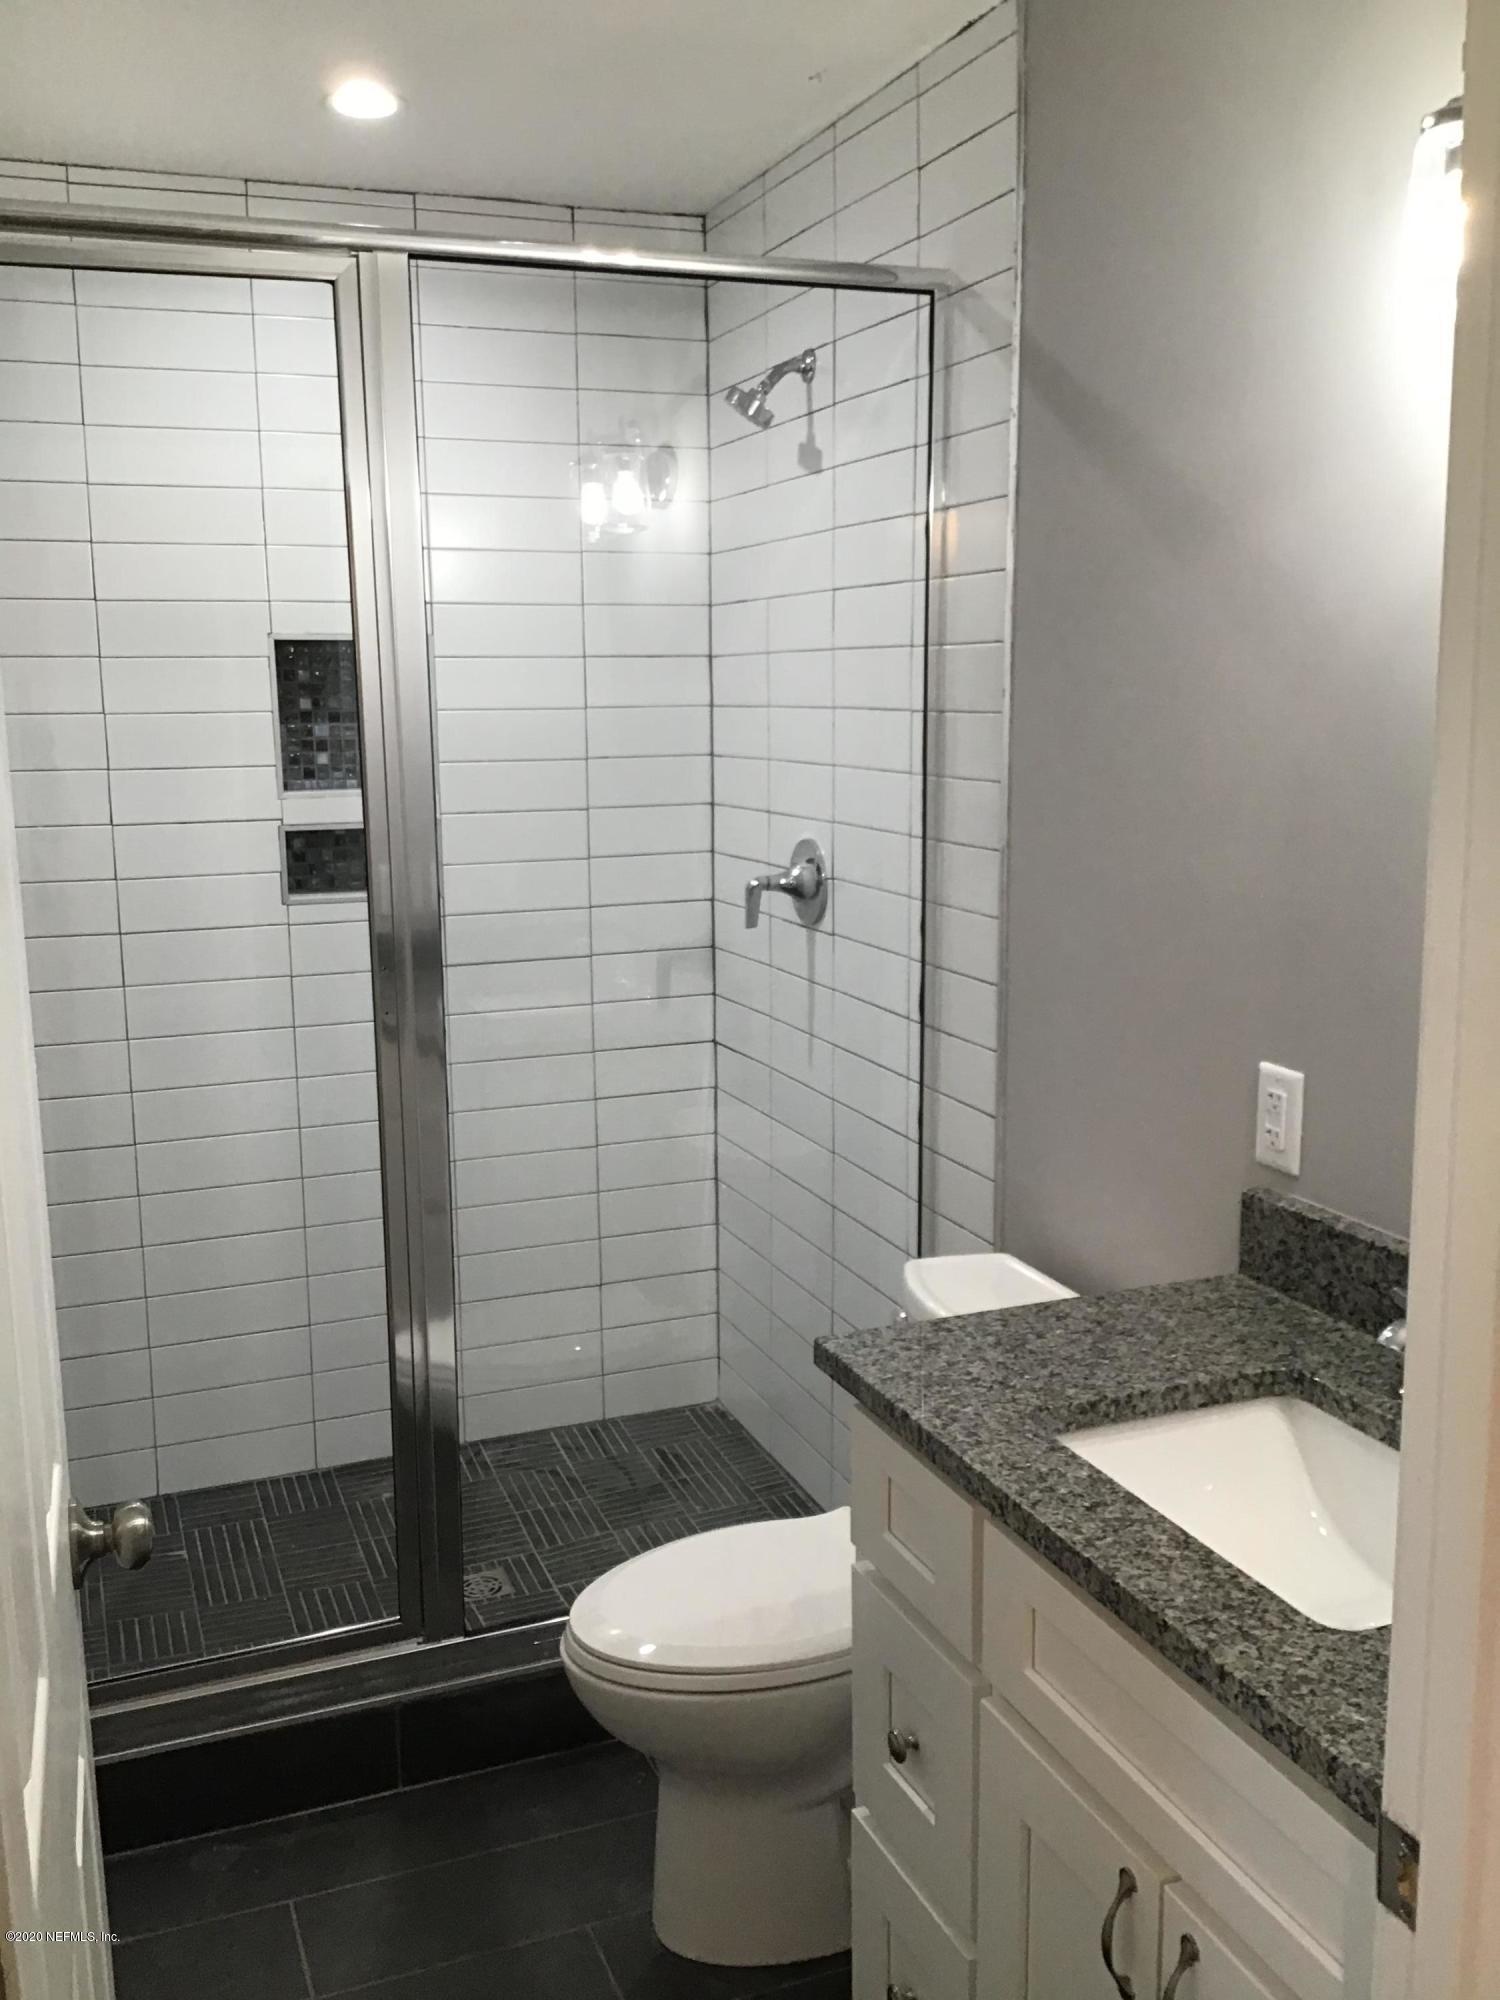 3356 SOUTEL, JACKSONVILLE, FLORIDA 32208, 3 Bedrooms Bedrooms, ,3 BathroomsBathrooms,Residential,For sale,SOUTEL,1081564